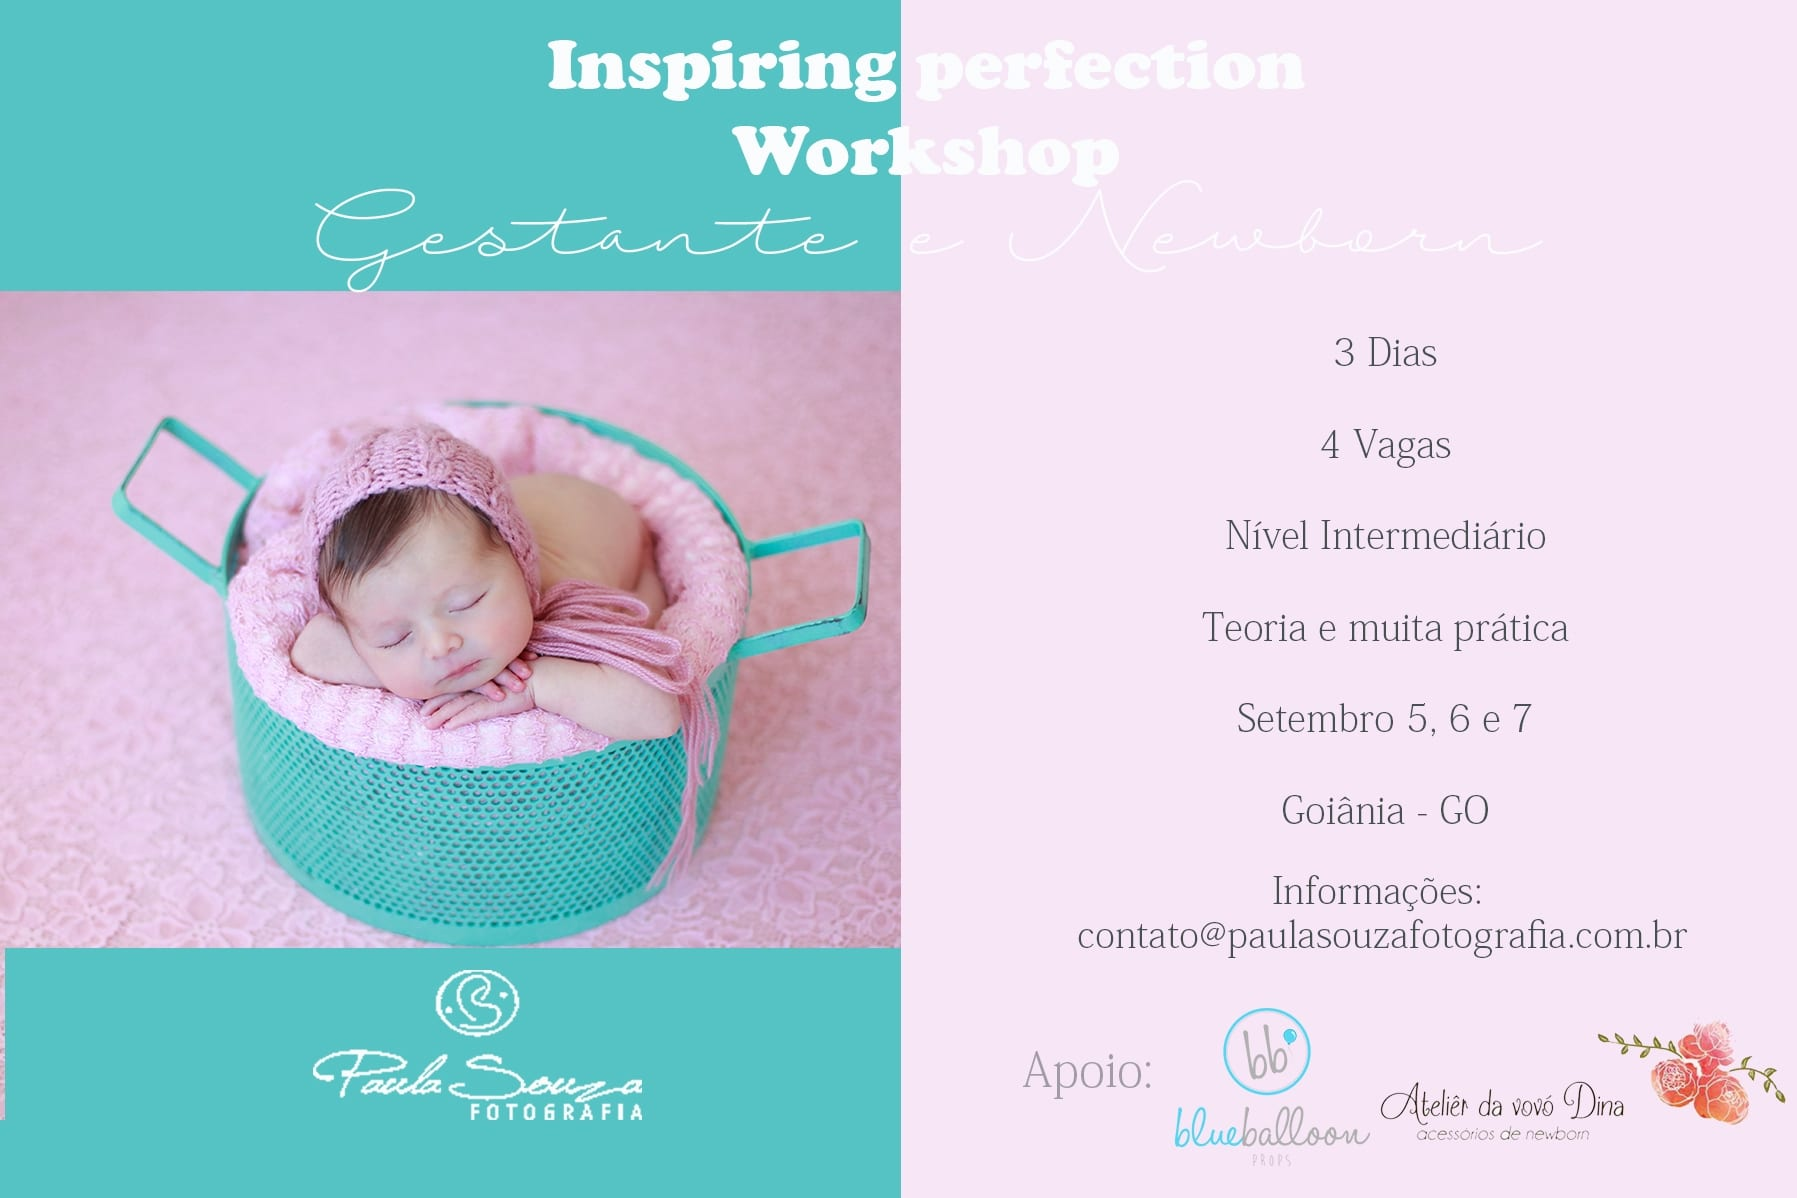 Workshop, paula Souza fotografia, Inspiring perfection, gestante, newborn, goiania, brasilia, anapolis